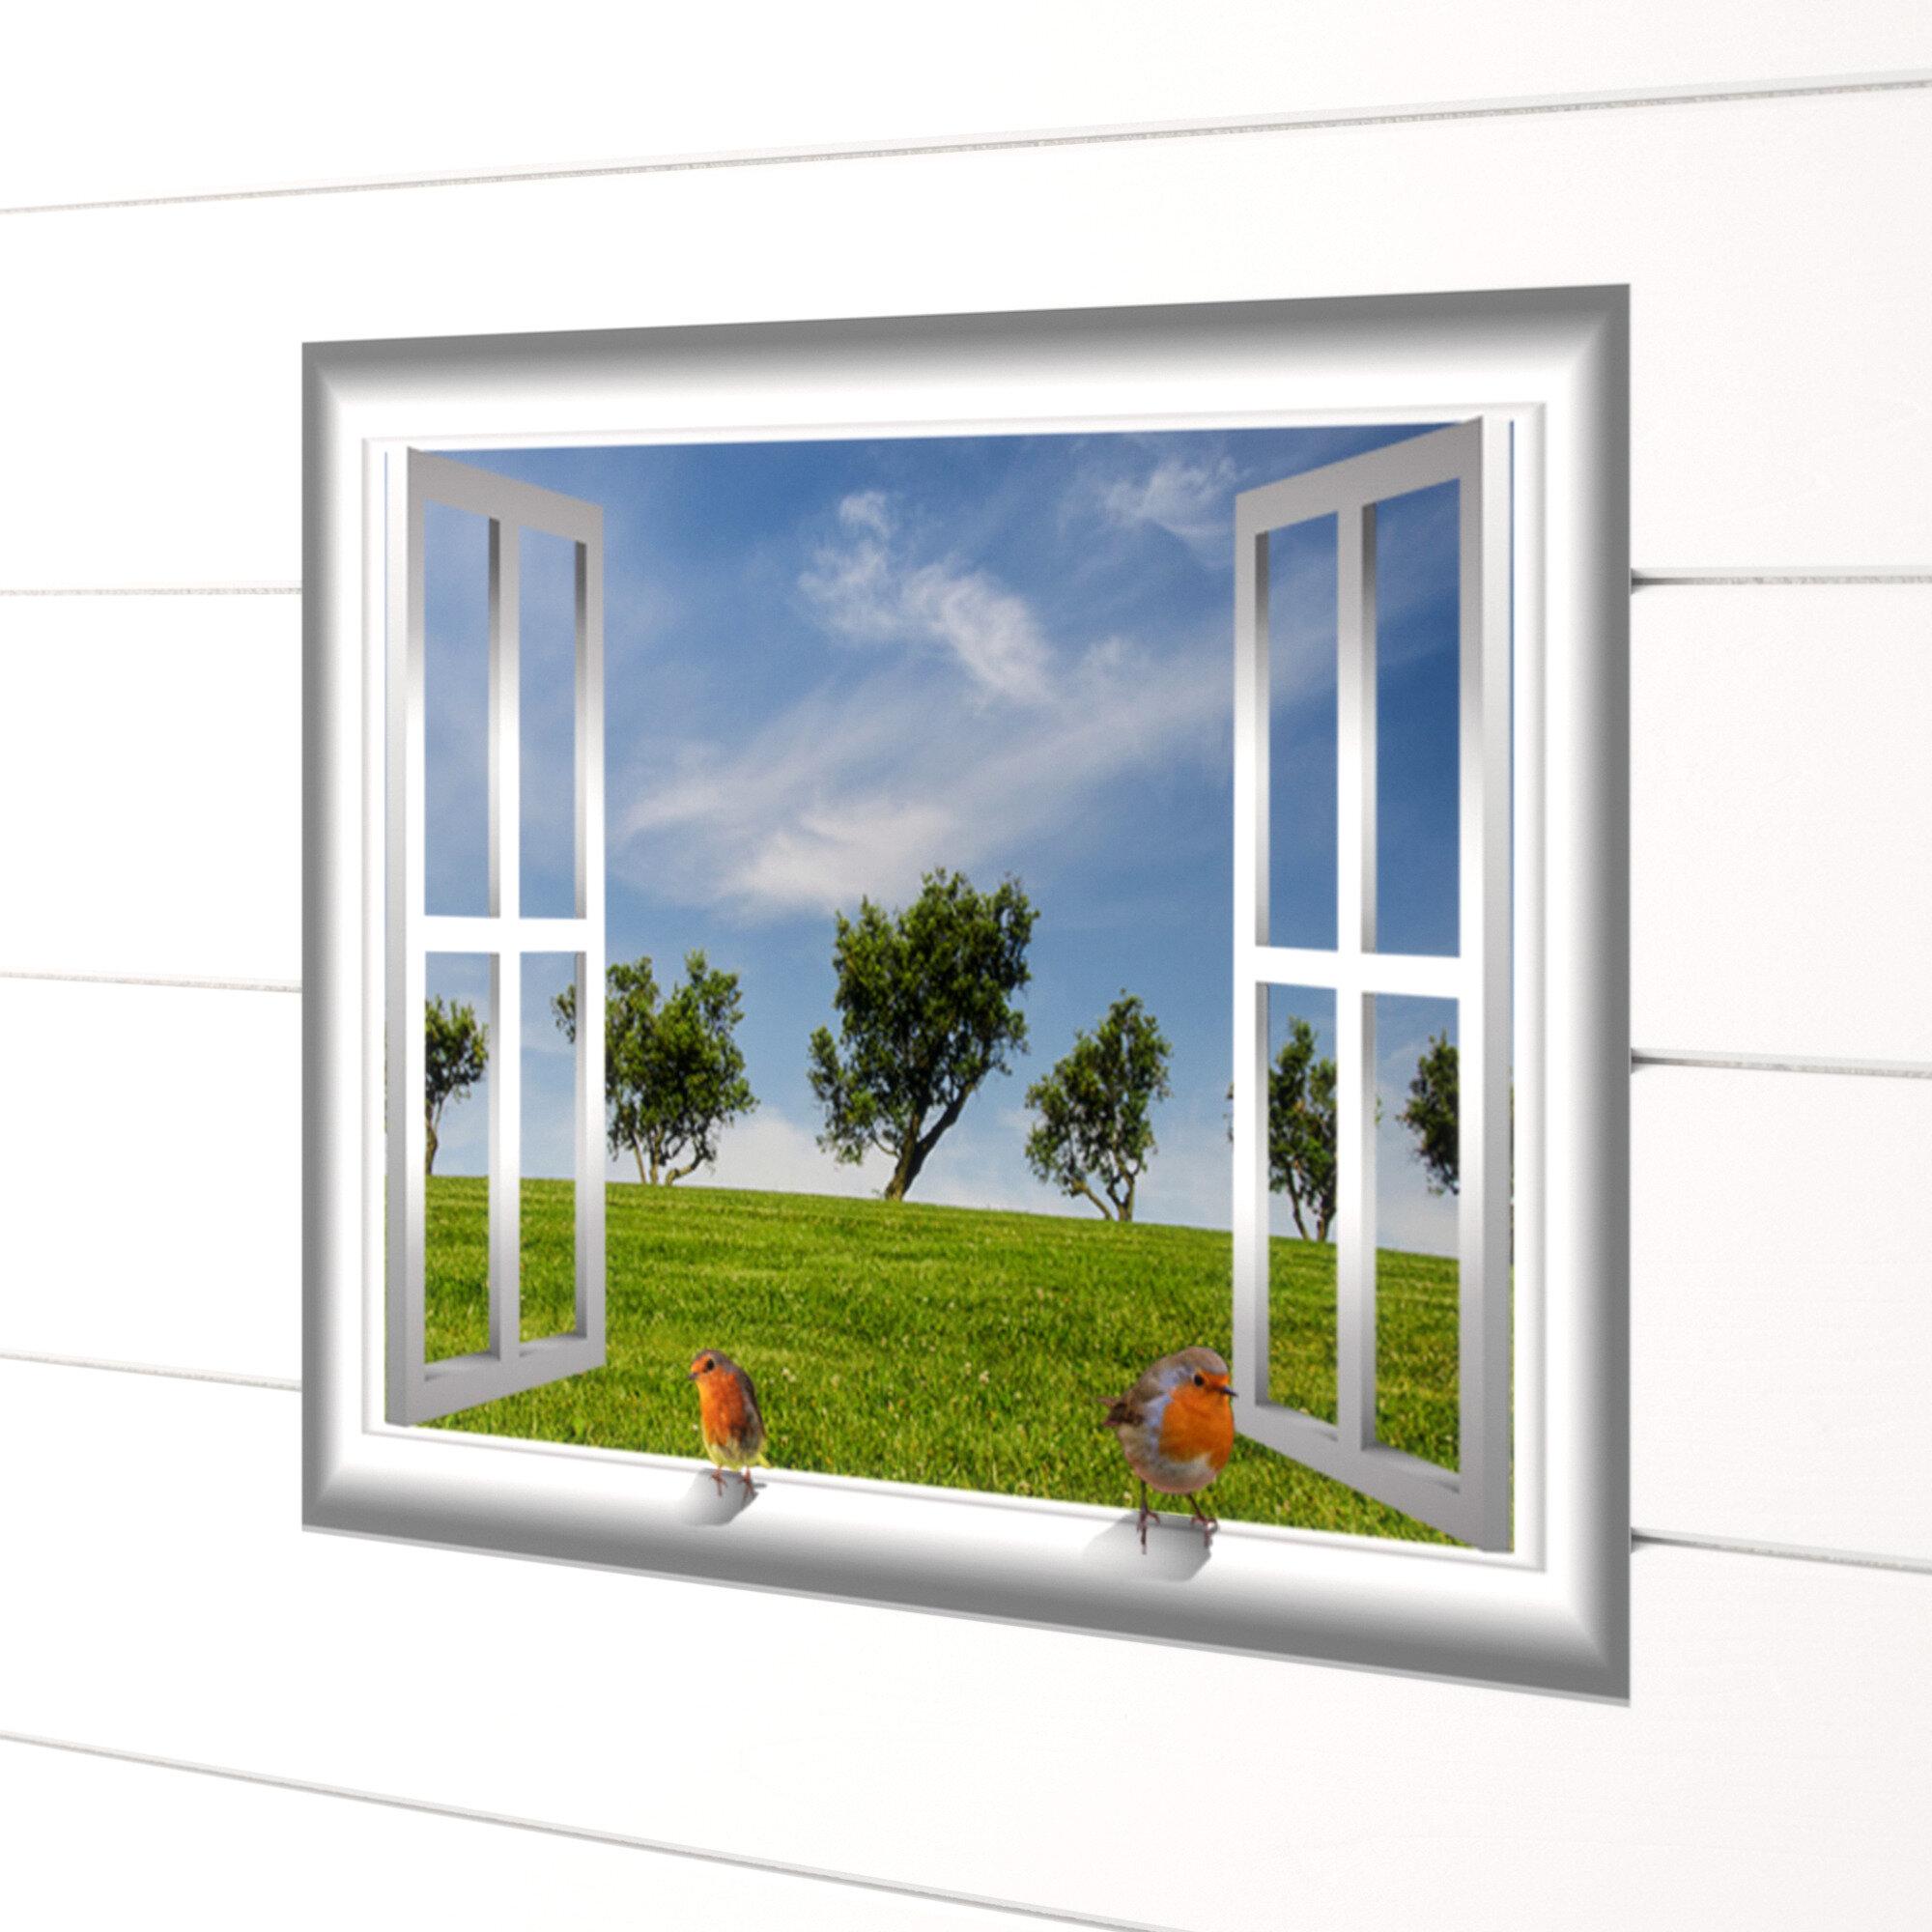 3d Window Wall Decal Window View Wall Mural Desert Wall Decal Nature Wall Decal Desert Window Frame Bedroom Living Room Home Wall Decor